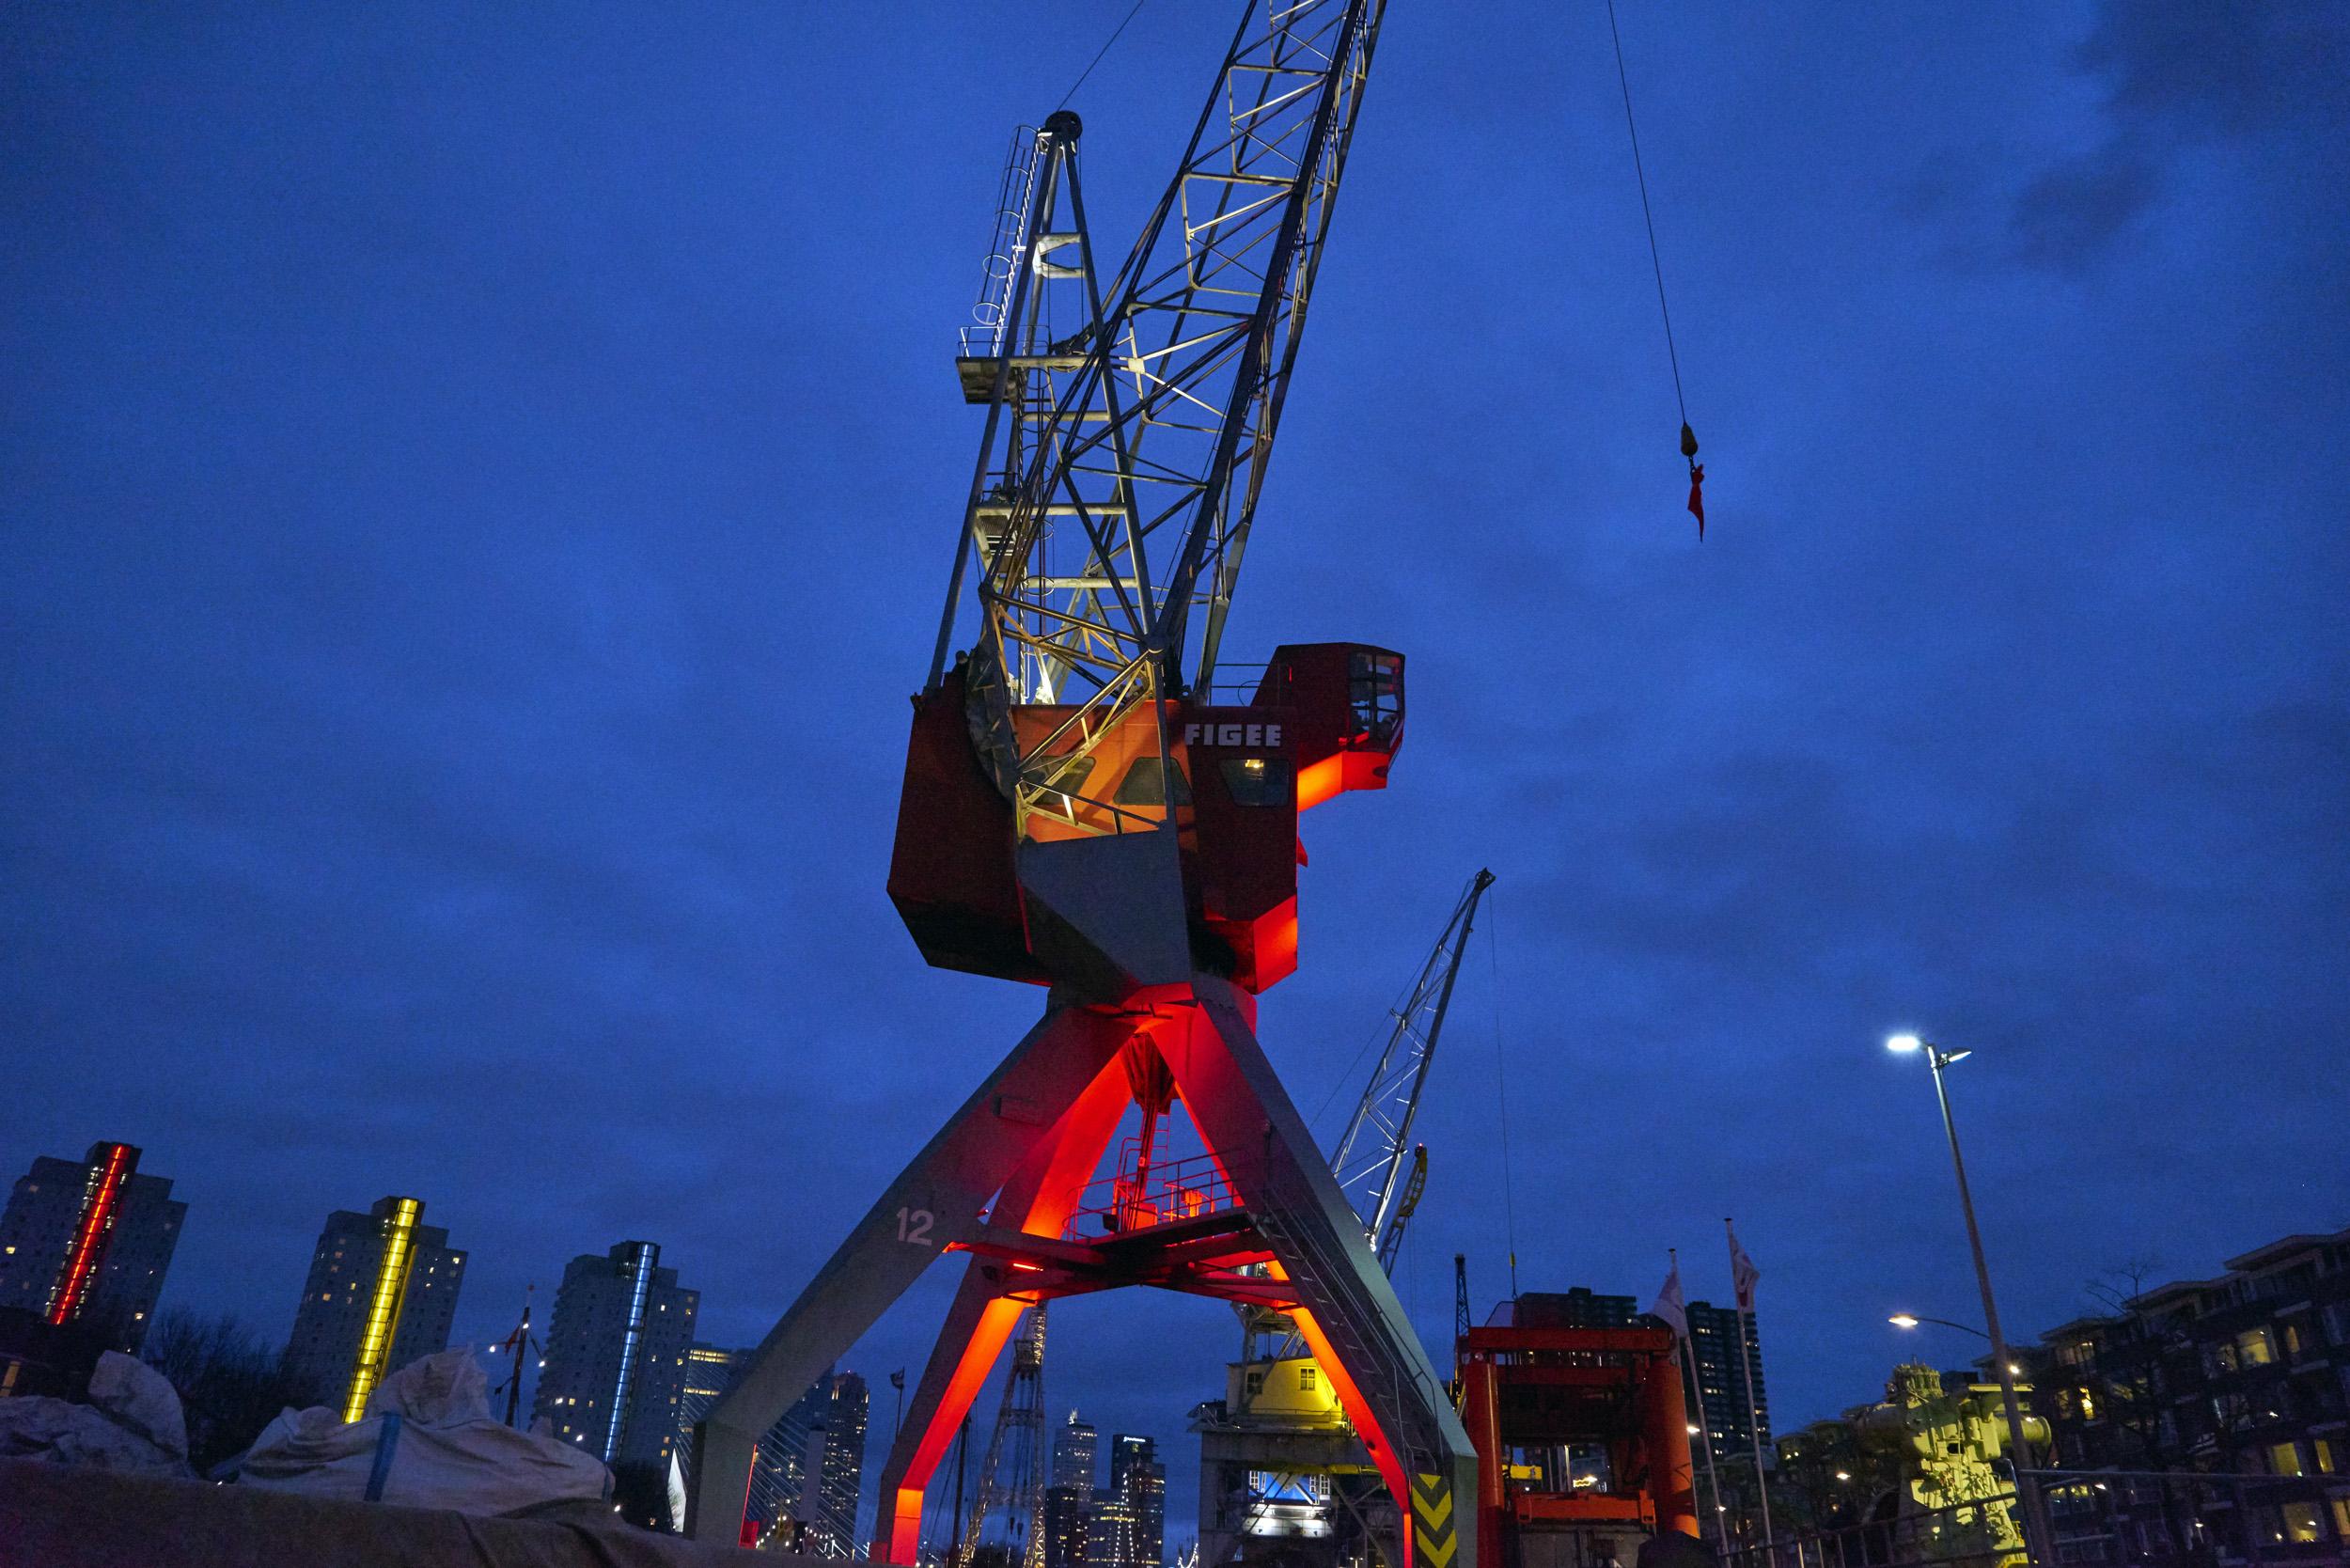 Rotterdam Historic Crane # 2